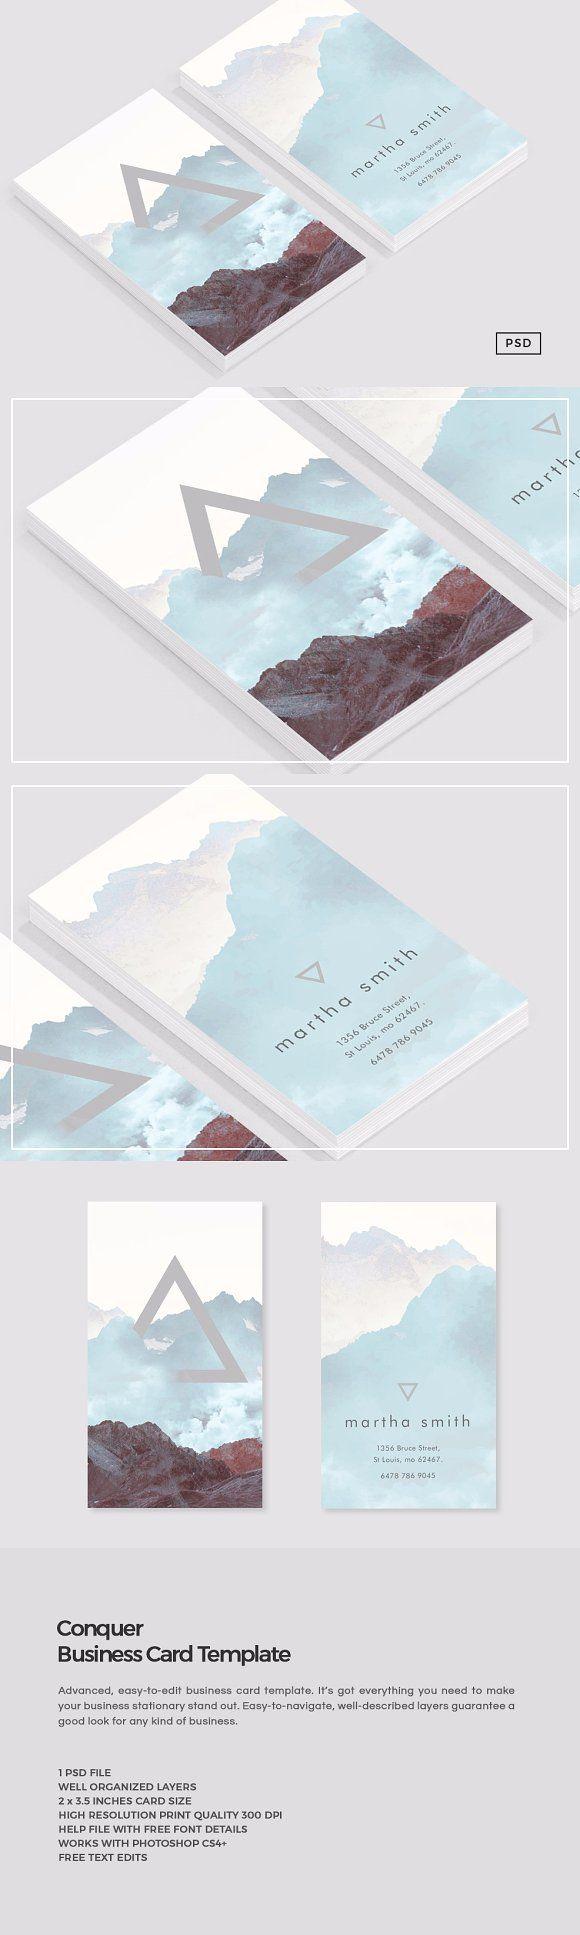 Conquer Business Card Template | Pinterest | Tarjetas presentacion ...